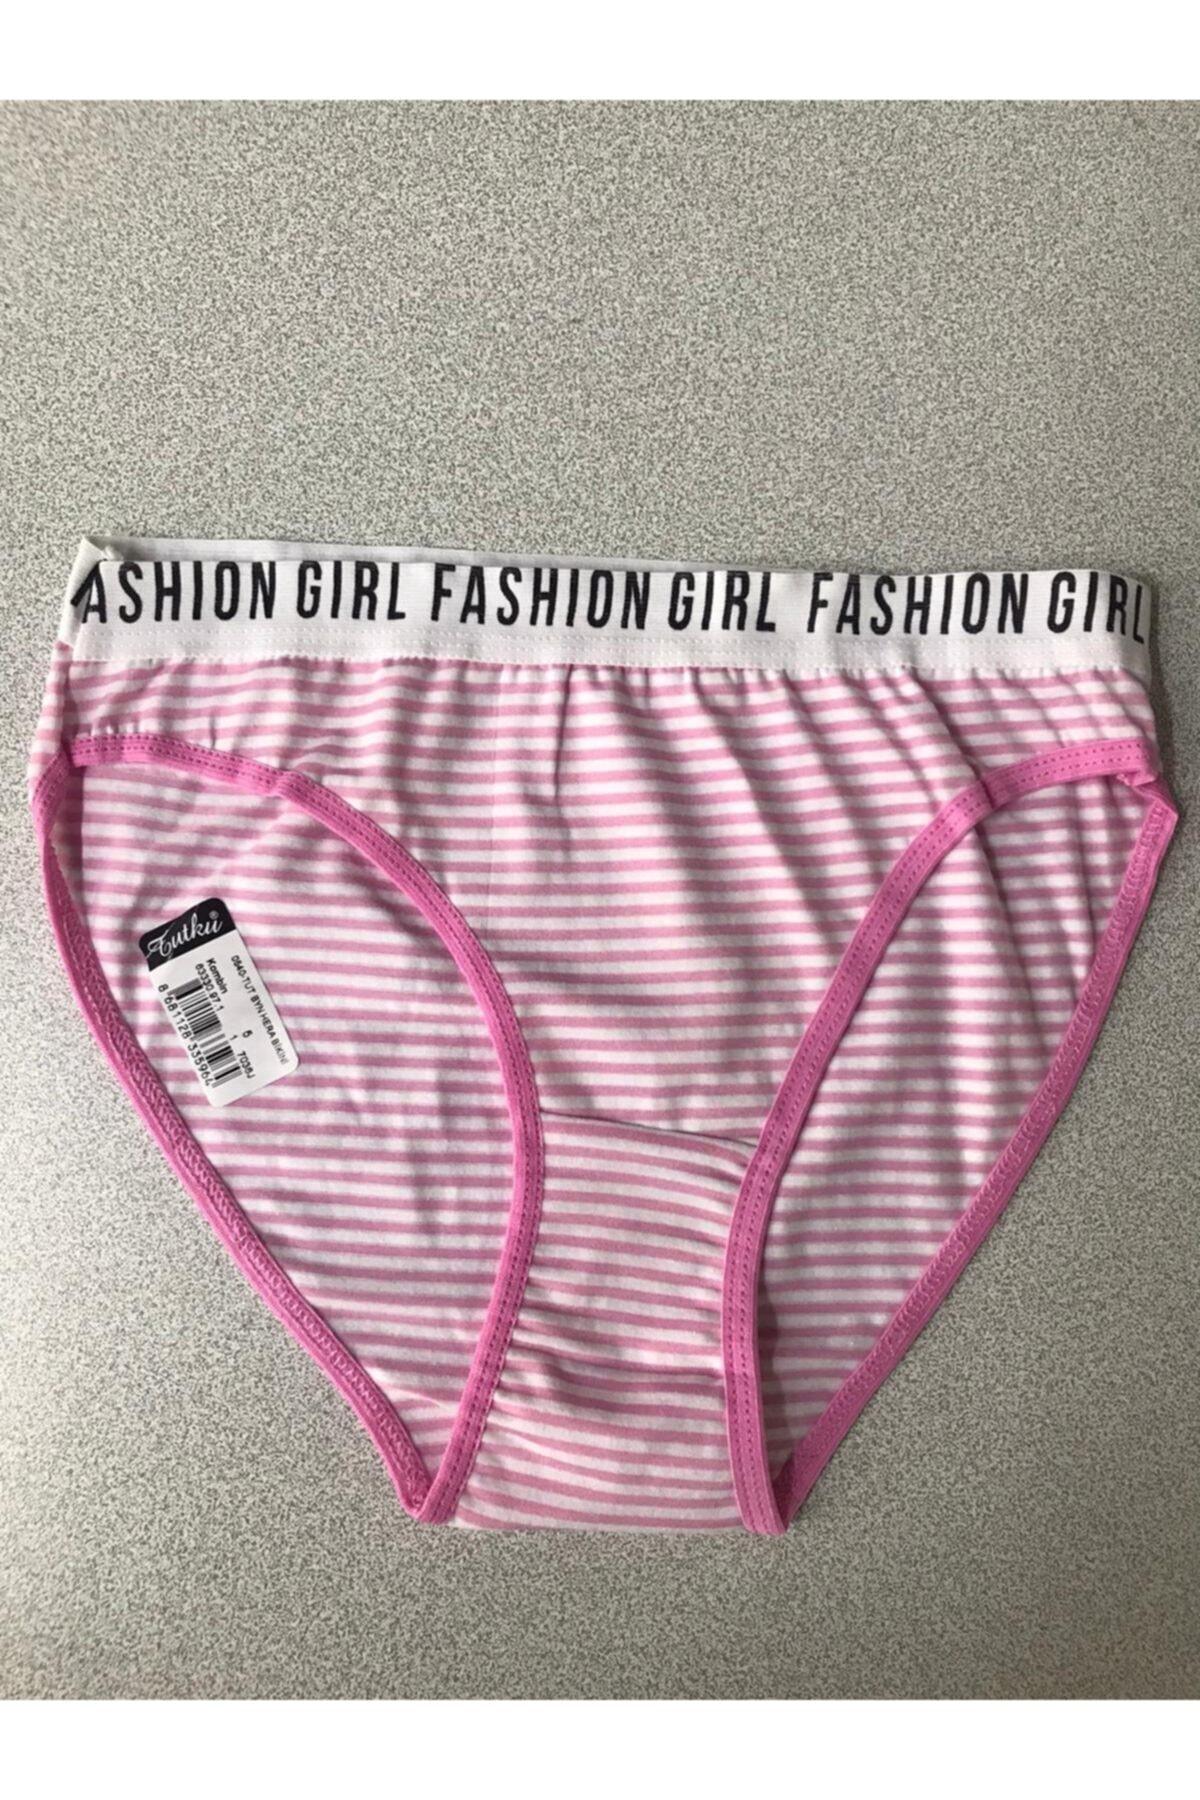 Tutku 12'li Paket Bayan Kadın Desenli Bikini Külot Asorti Kilot 2